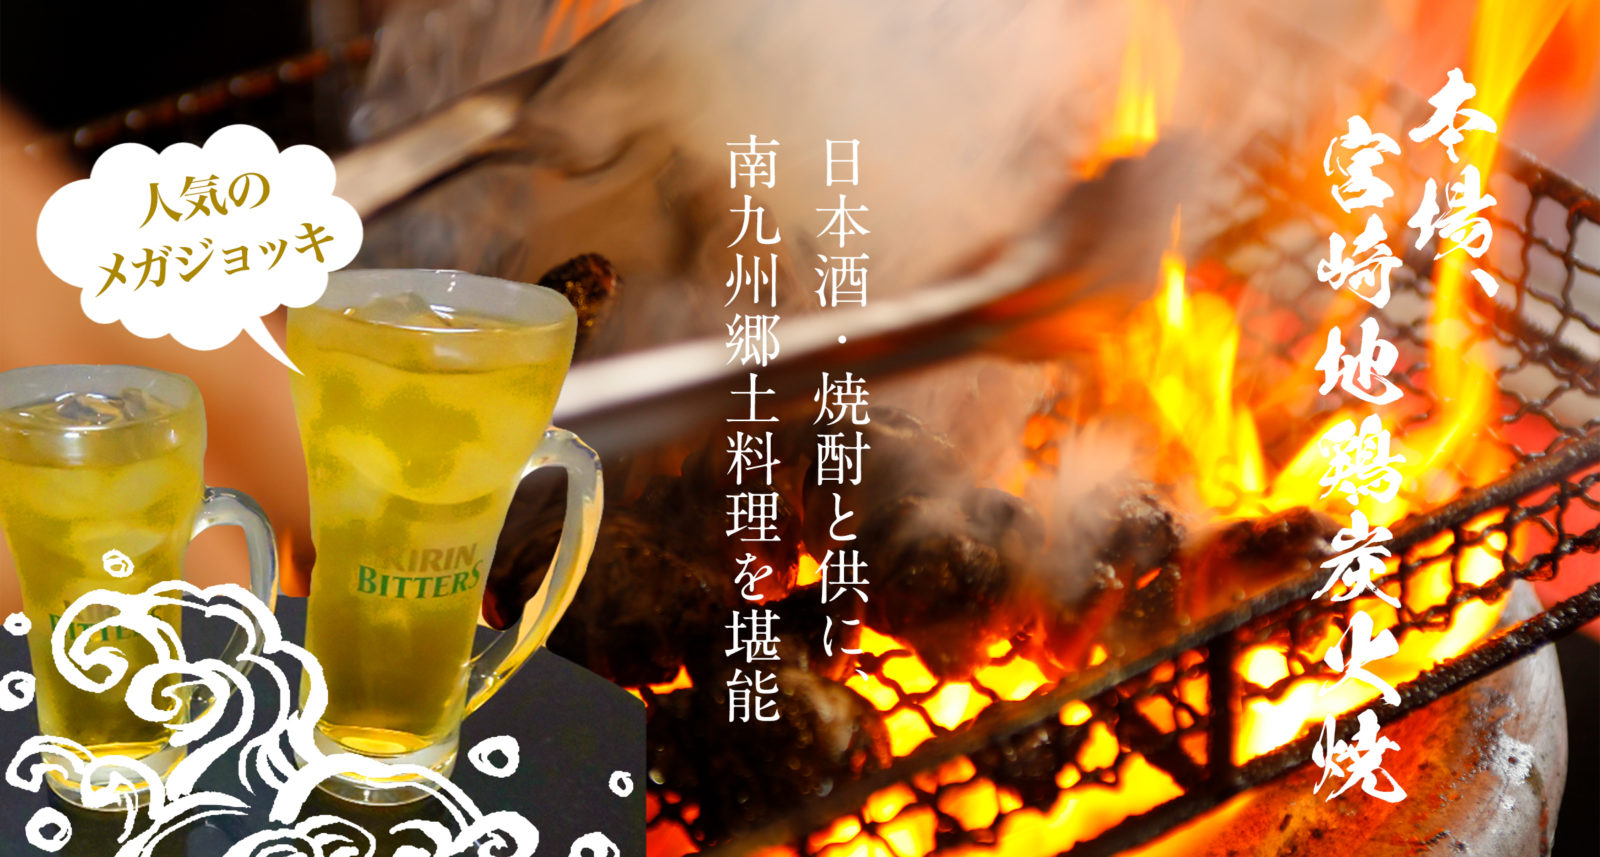 日本酒・焼酎と供に、 南九州郷土料理を堪能